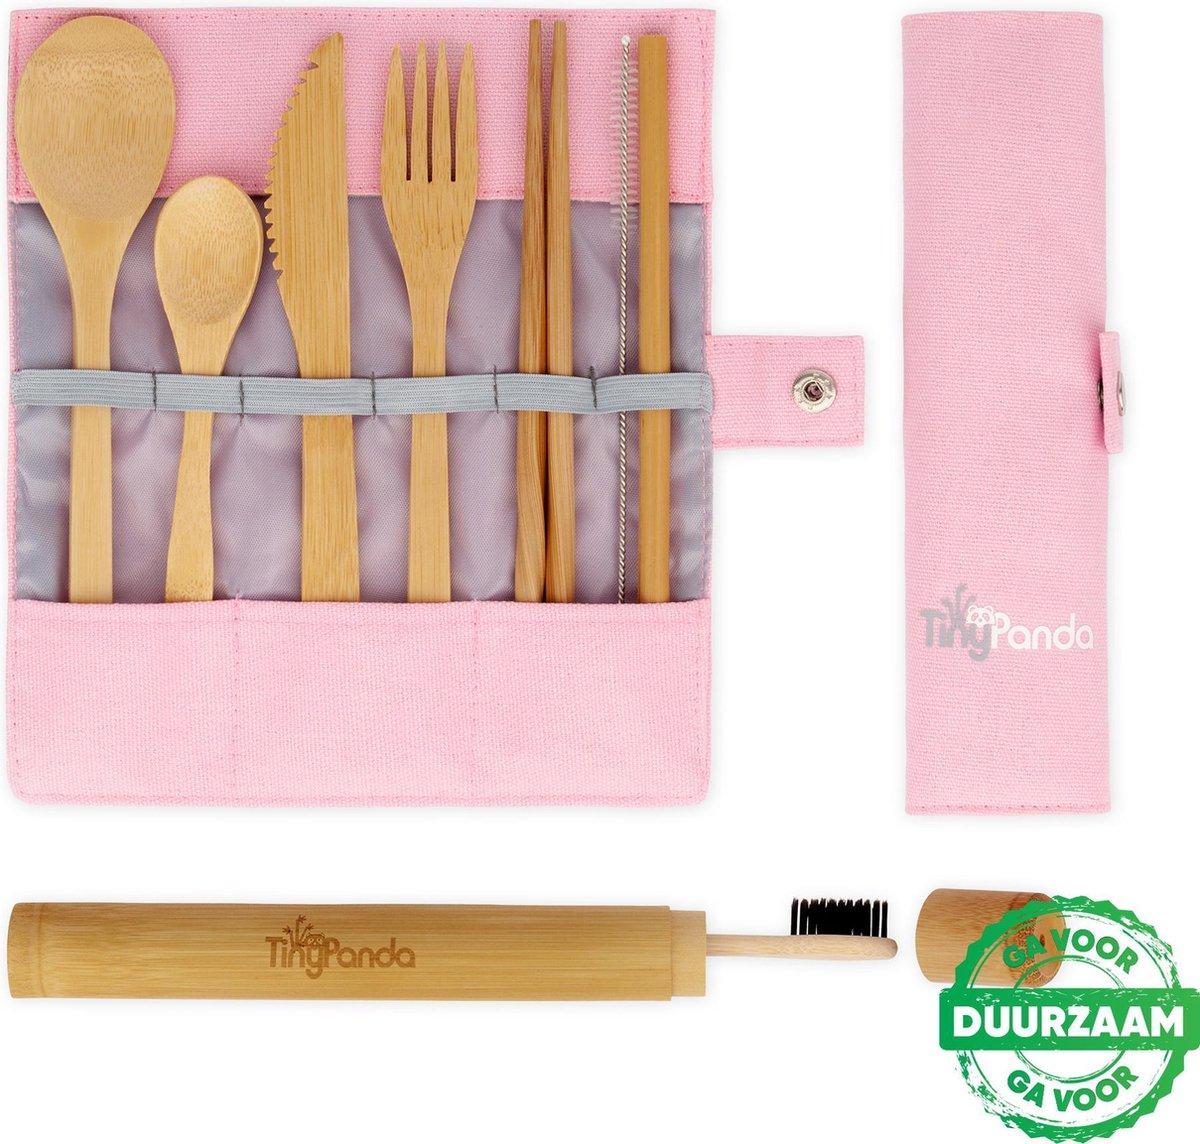 Bestek Set Roze van Bamboe met Bamboe Tandenborstel - Herbruikbaar Bamboe Servies - Camping Bestek - Bamboo Cutlery Set- Handig voor op reis - 10-delig met o.a. een herbruikbaar Bamboe Rietje